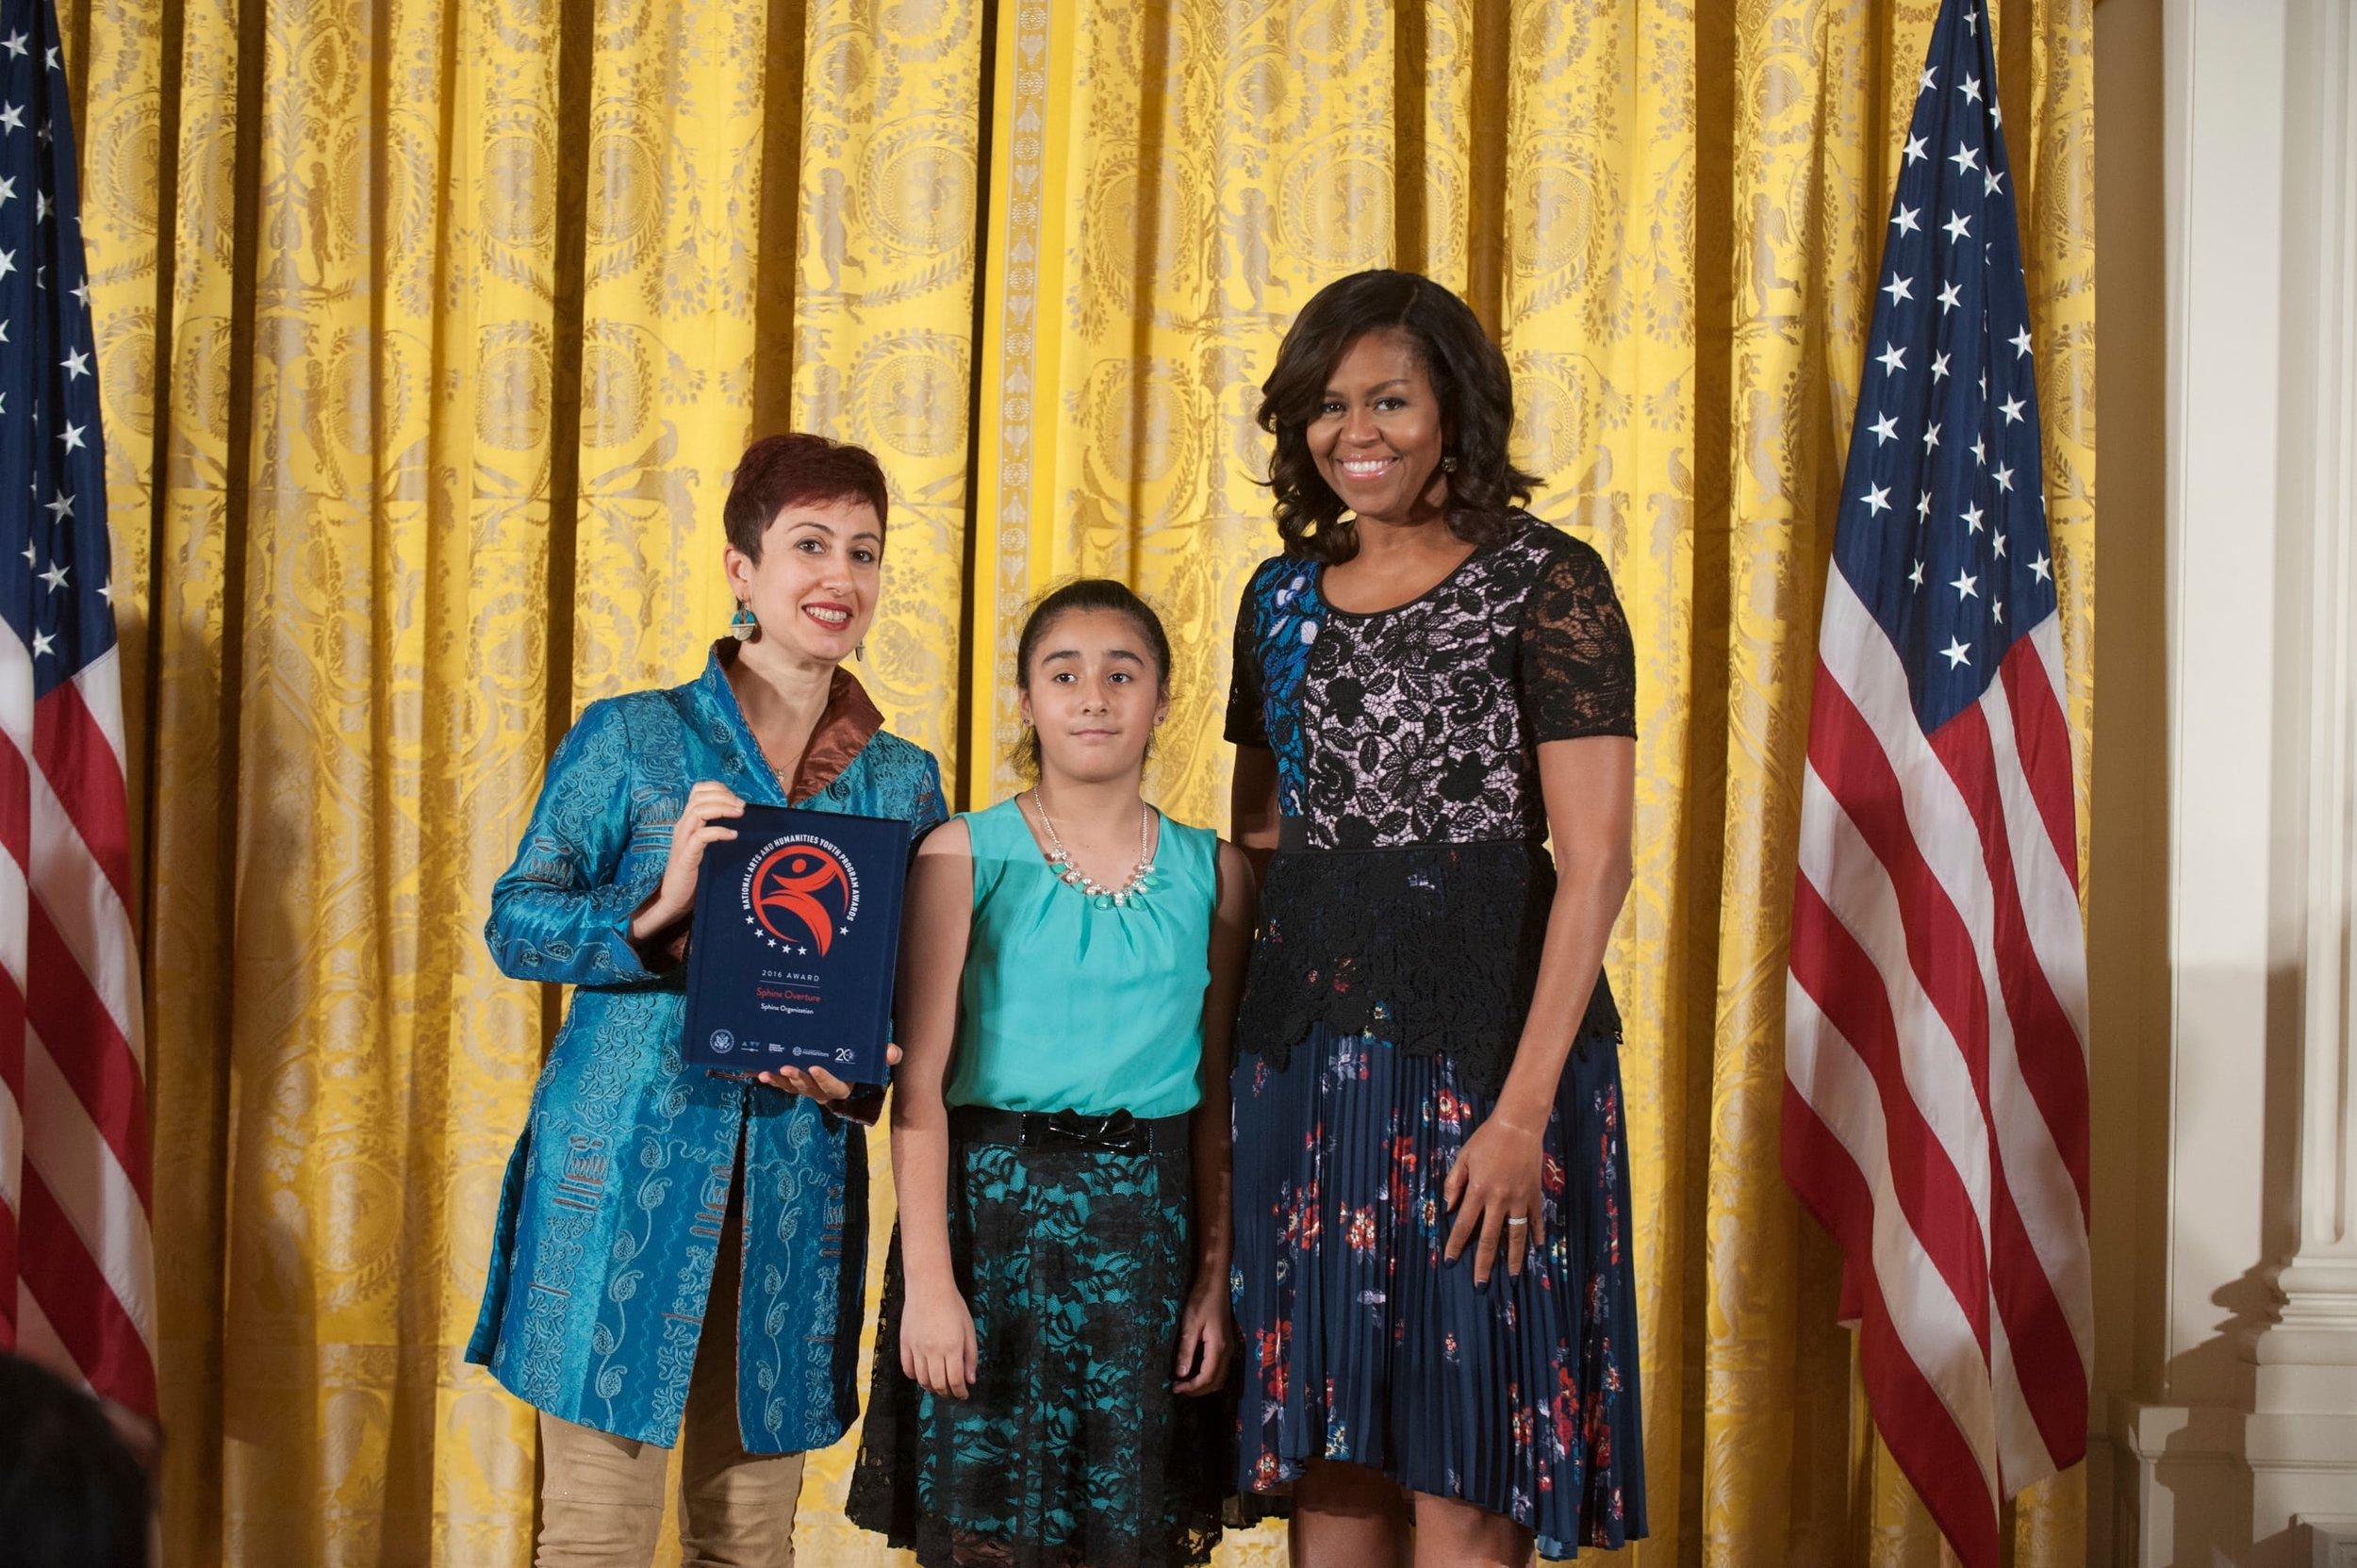 Self-Portrait  National Arts & Humanities Youth Program Awards, Washington DC - November 15, 2016